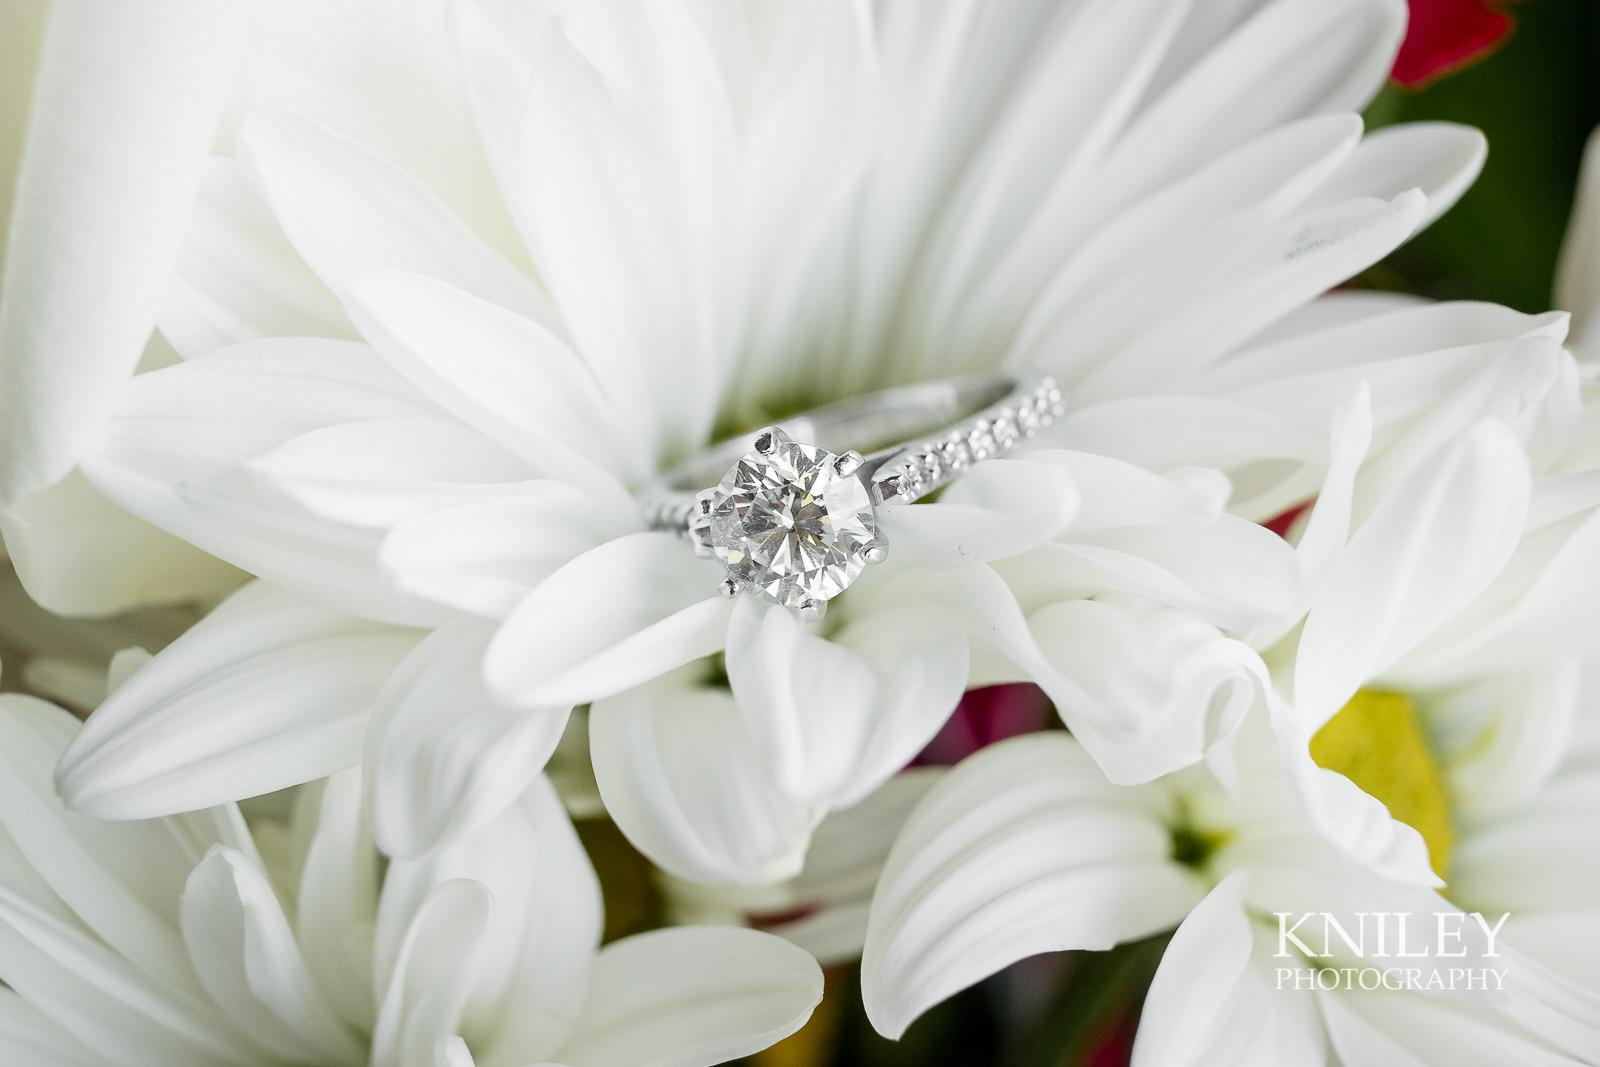 009 - Buffalo NY wedding - Preparation pictures - XT2A6546.jpg